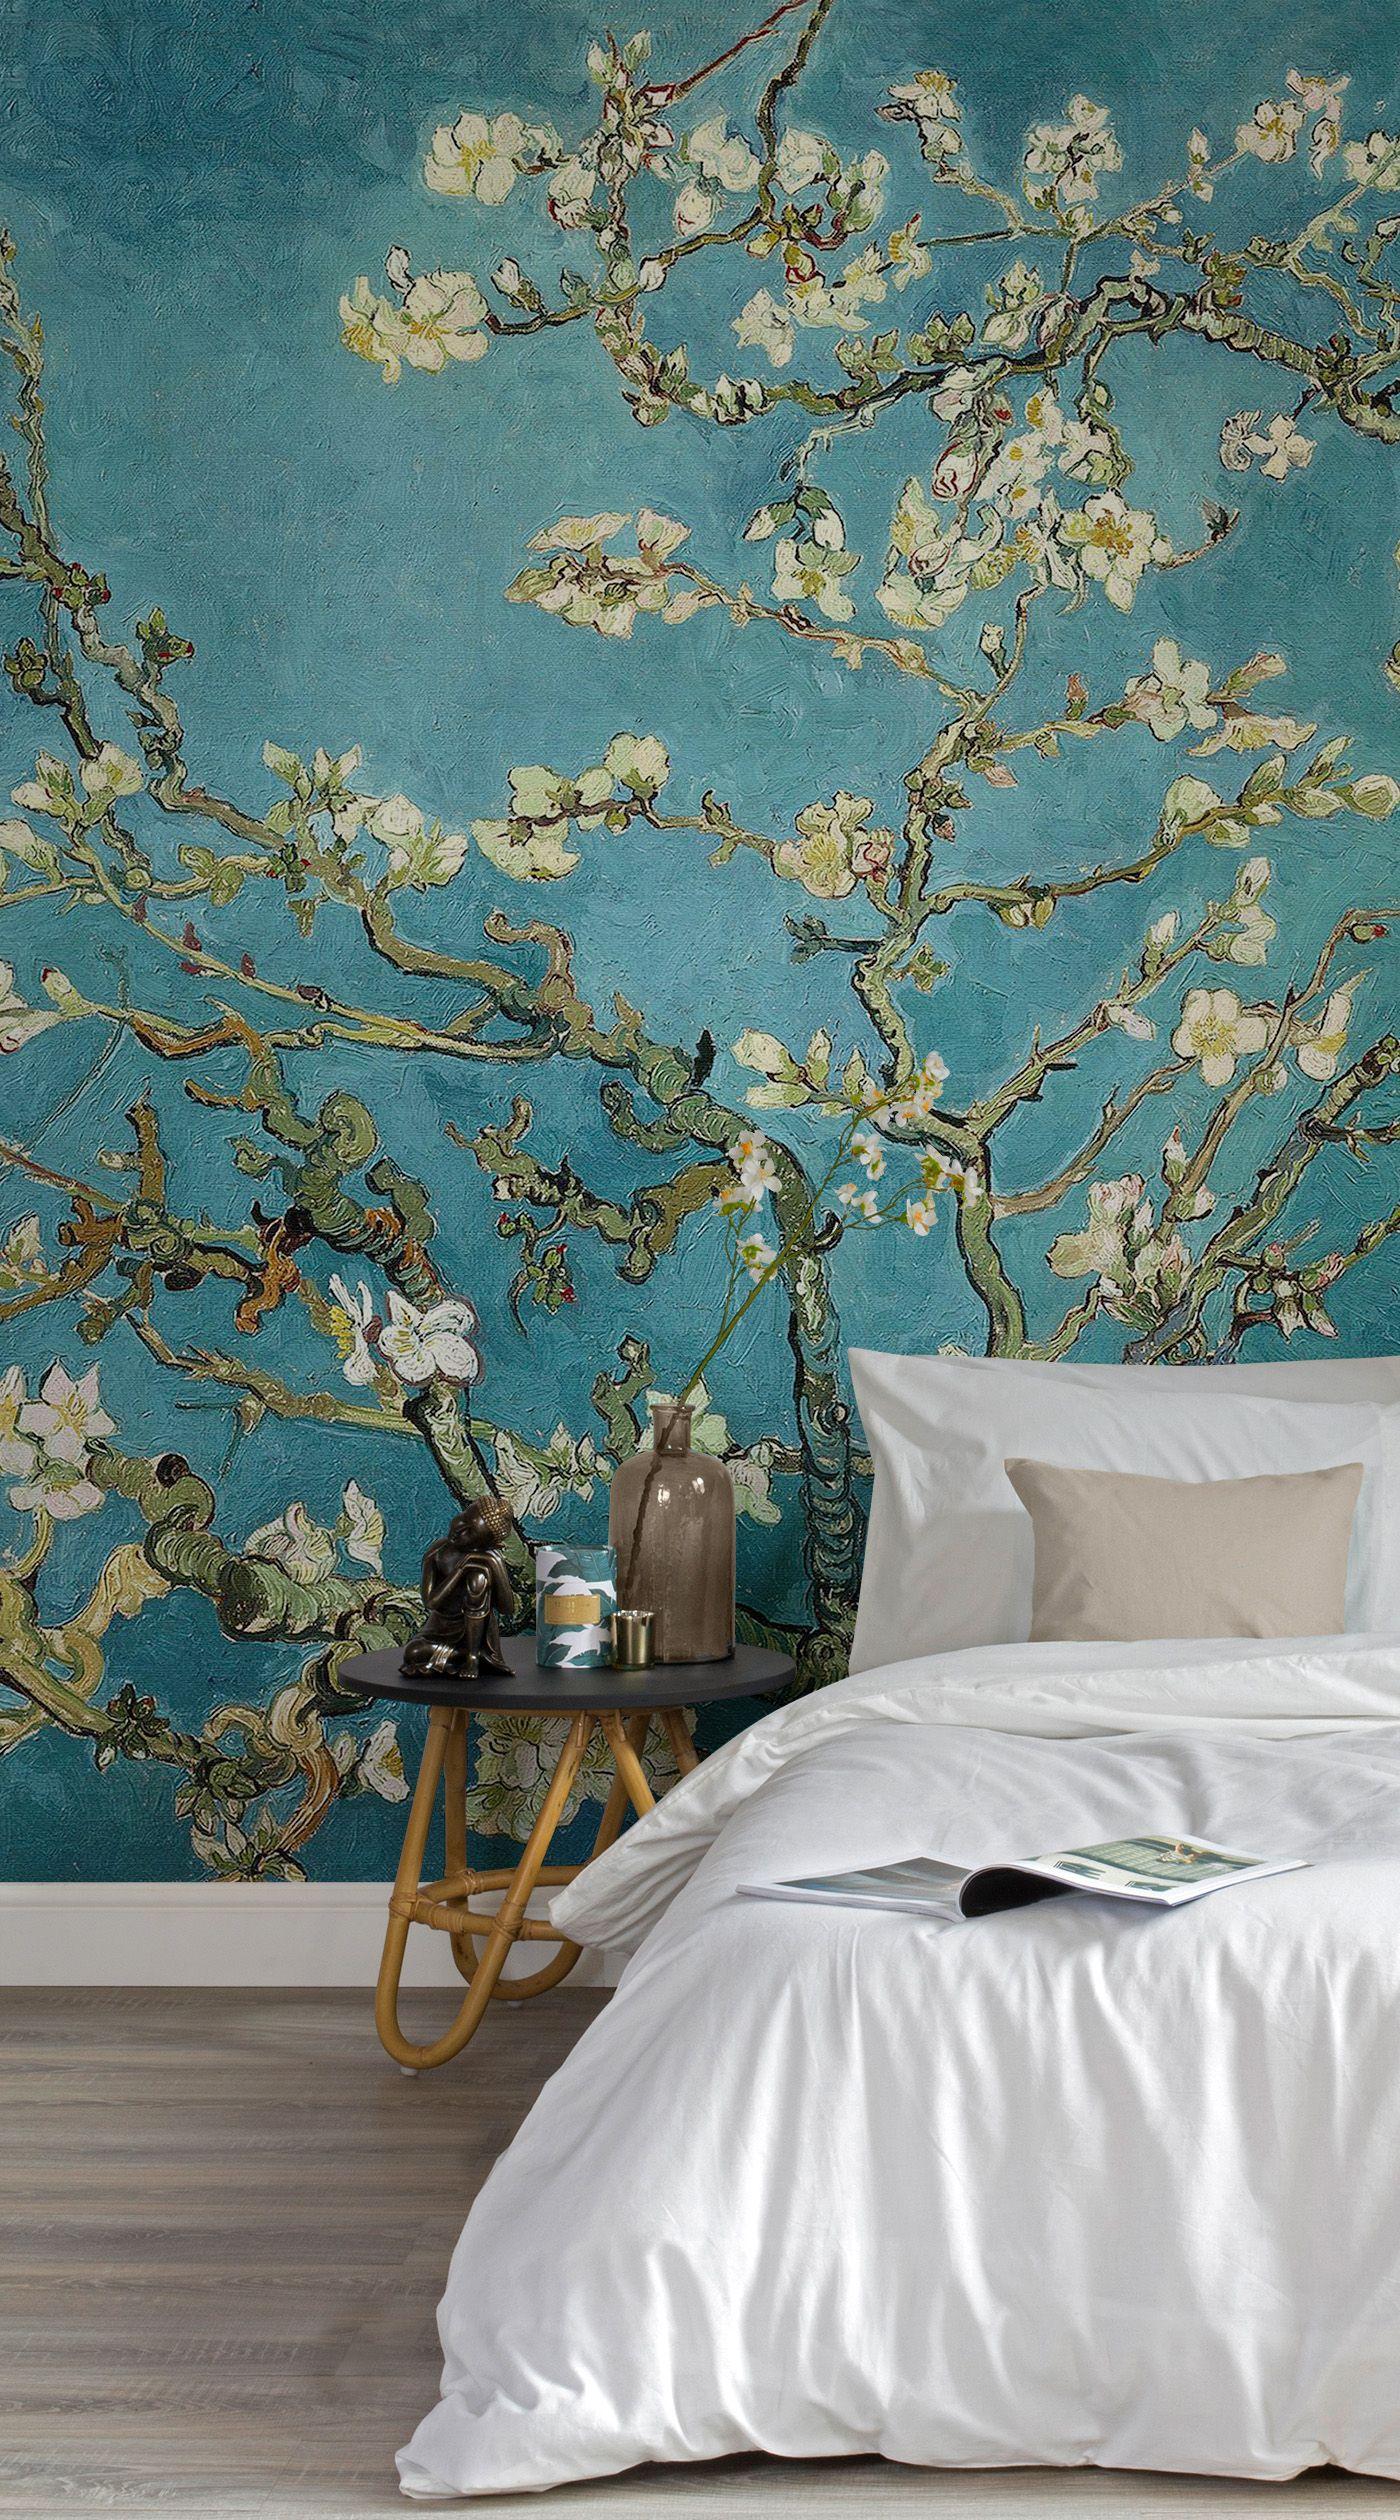 3D Wallpaper Rolls Almond Branches by Van Gogh Livingroom Bedroom Backdrop Mural